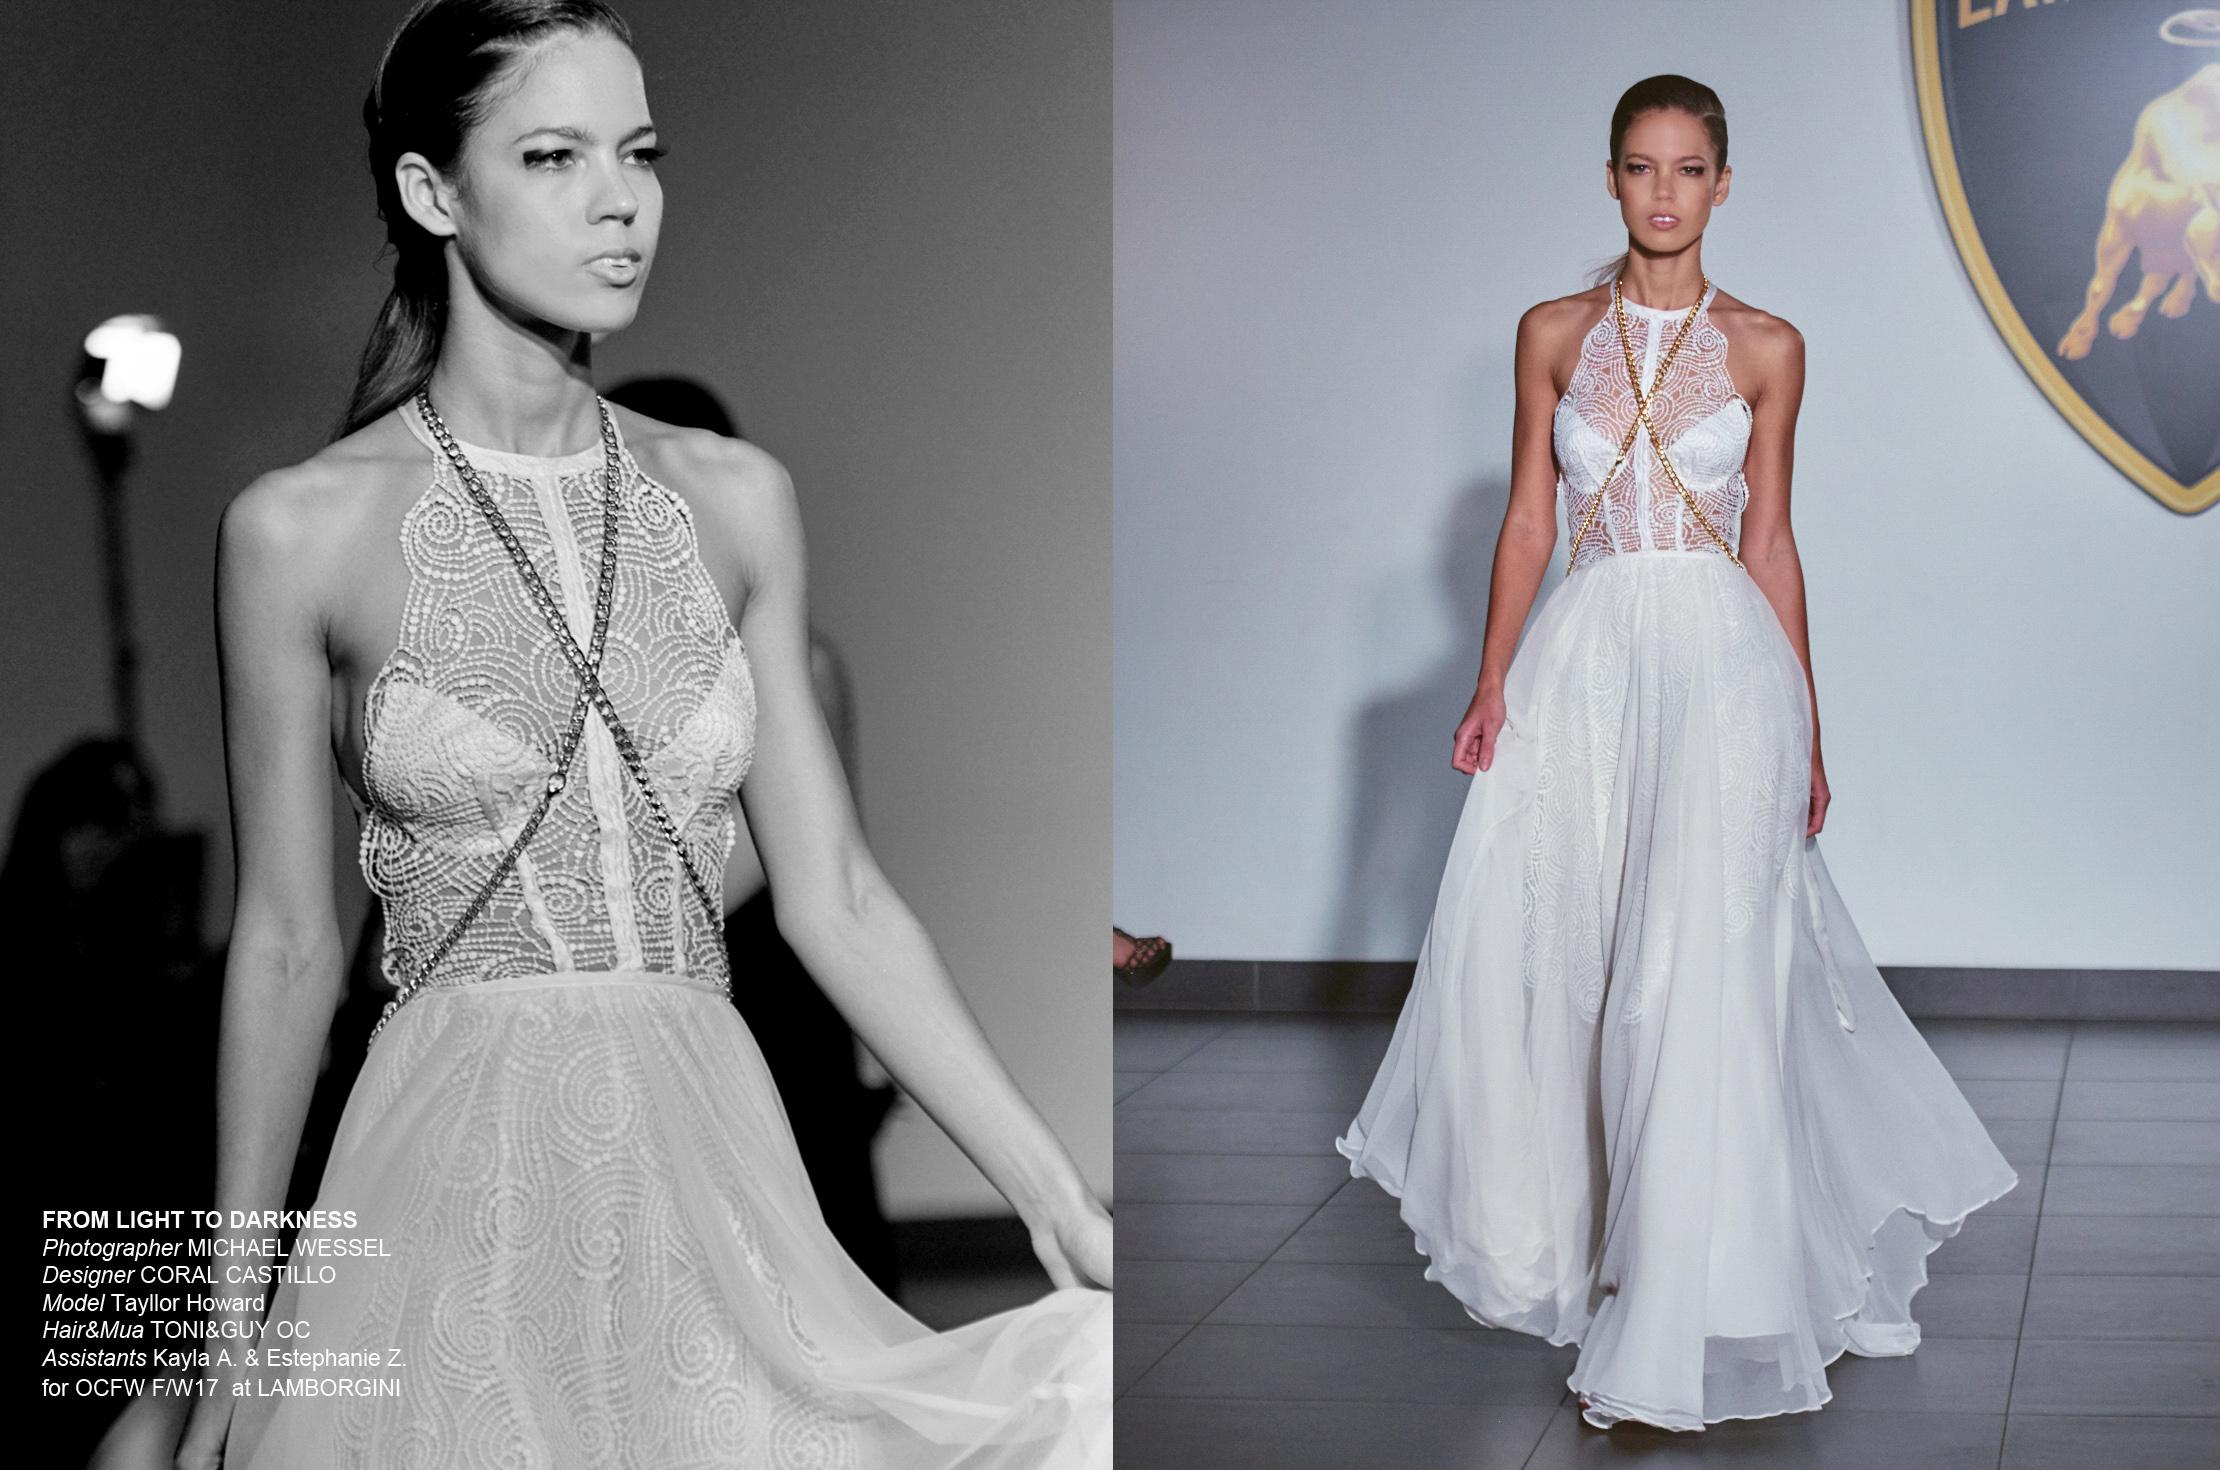 Coral Castillo - OC Fashion Week March 2017 - Photos by Michael Wessel & cREAtive Castle Studios (www.creativecastlestudios.com-Coral-Castillo and www.creativecastlestudios.com-michael-wessel)-13.jpg